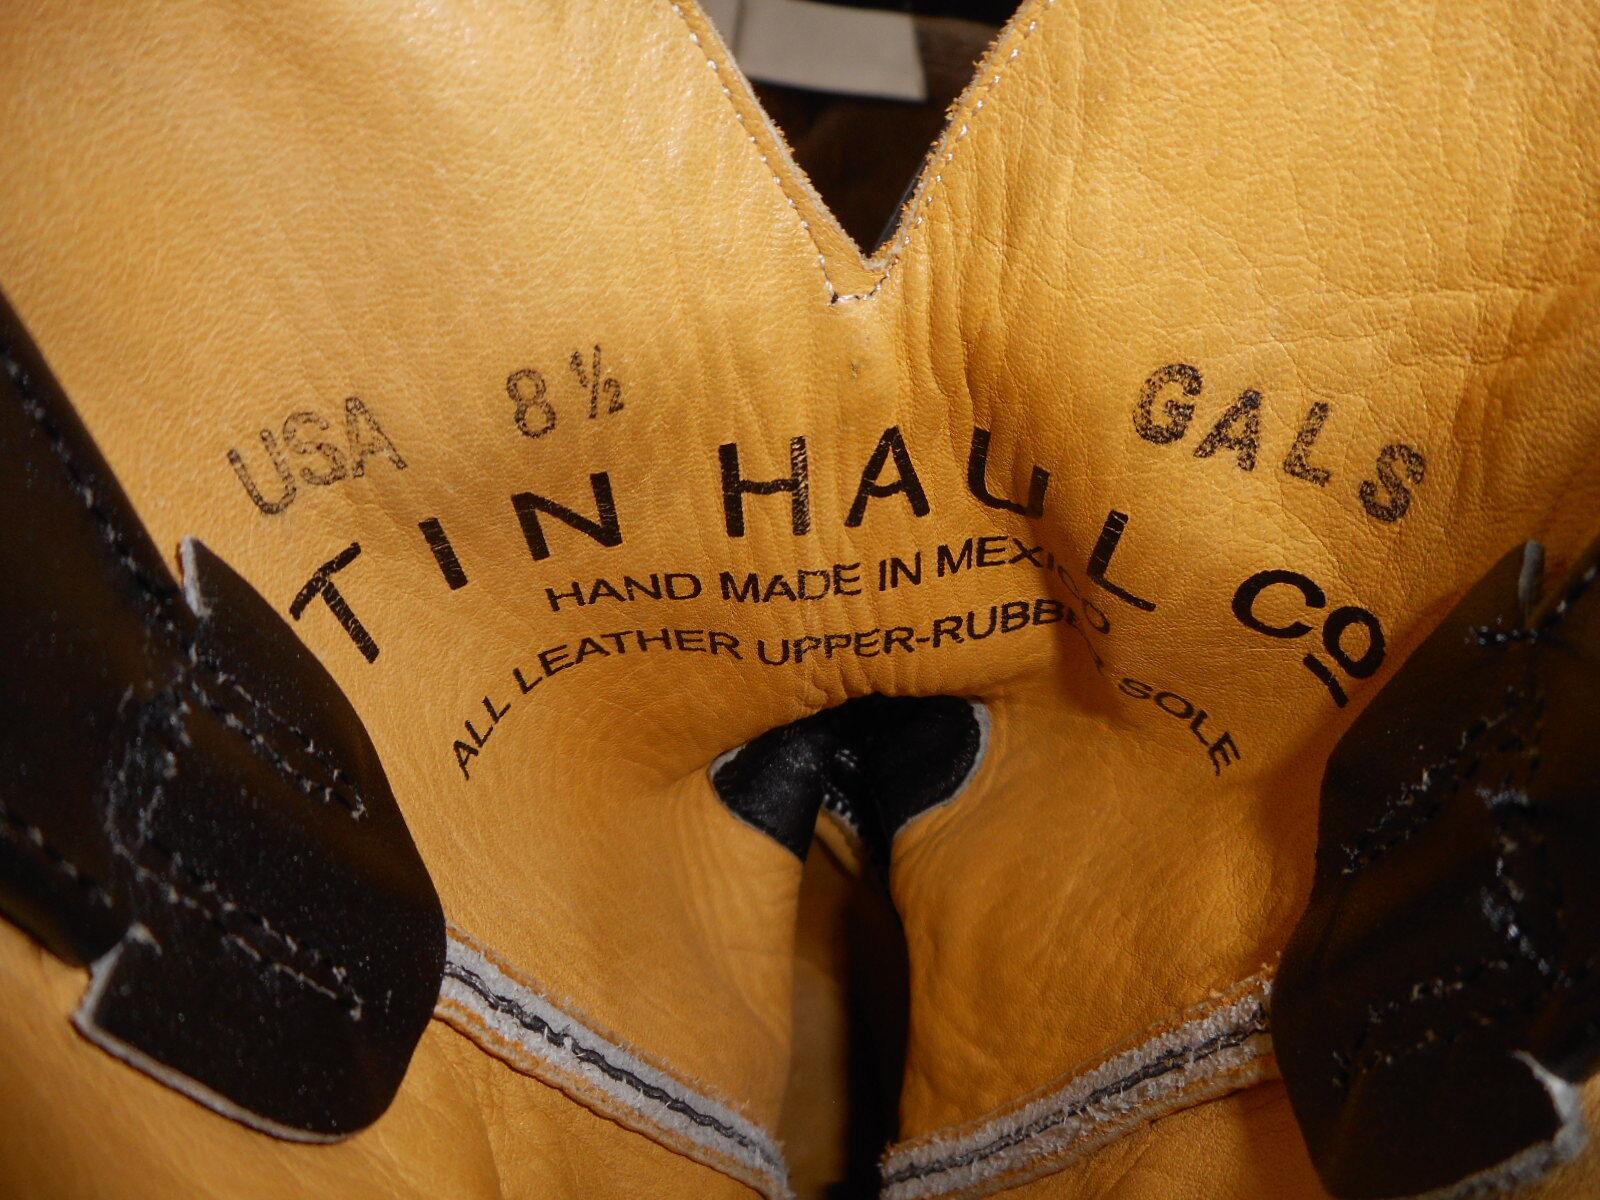 Tin Tin Tin Haul Donna Stivali 8.5 B Used Cowboy Western Riding Electric Kitty Cheetah 4f541c